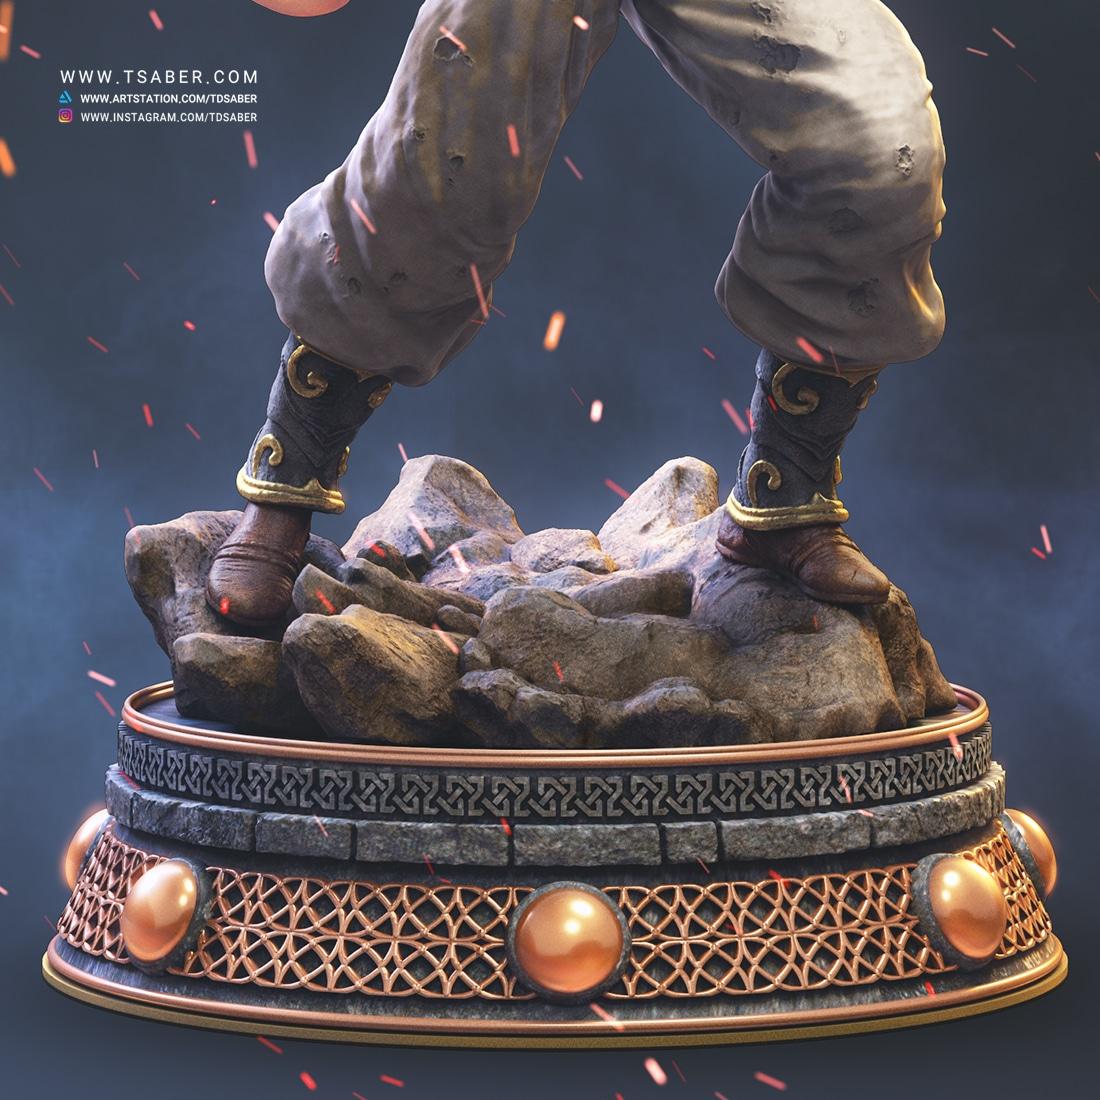 Super Buu Statue - Dragonball Z Collectible - Tsaber